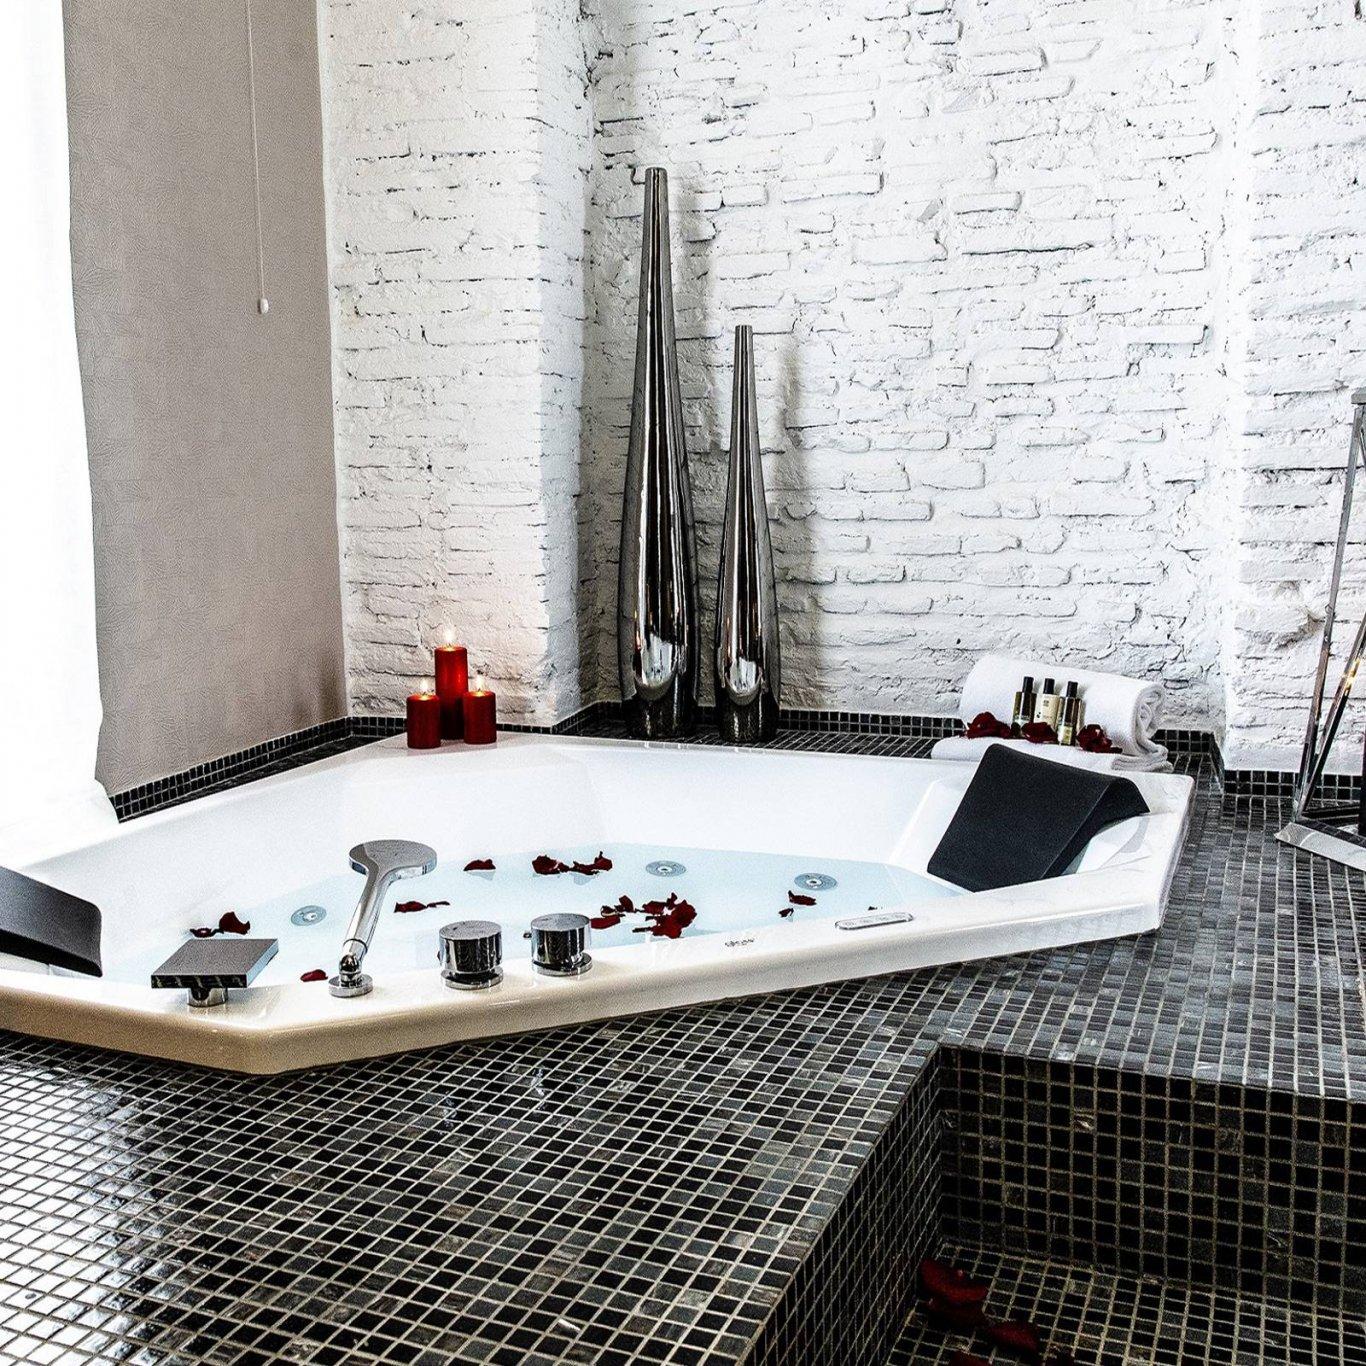 Dharma-luxury-hotel-wllness-suite-new-4-1